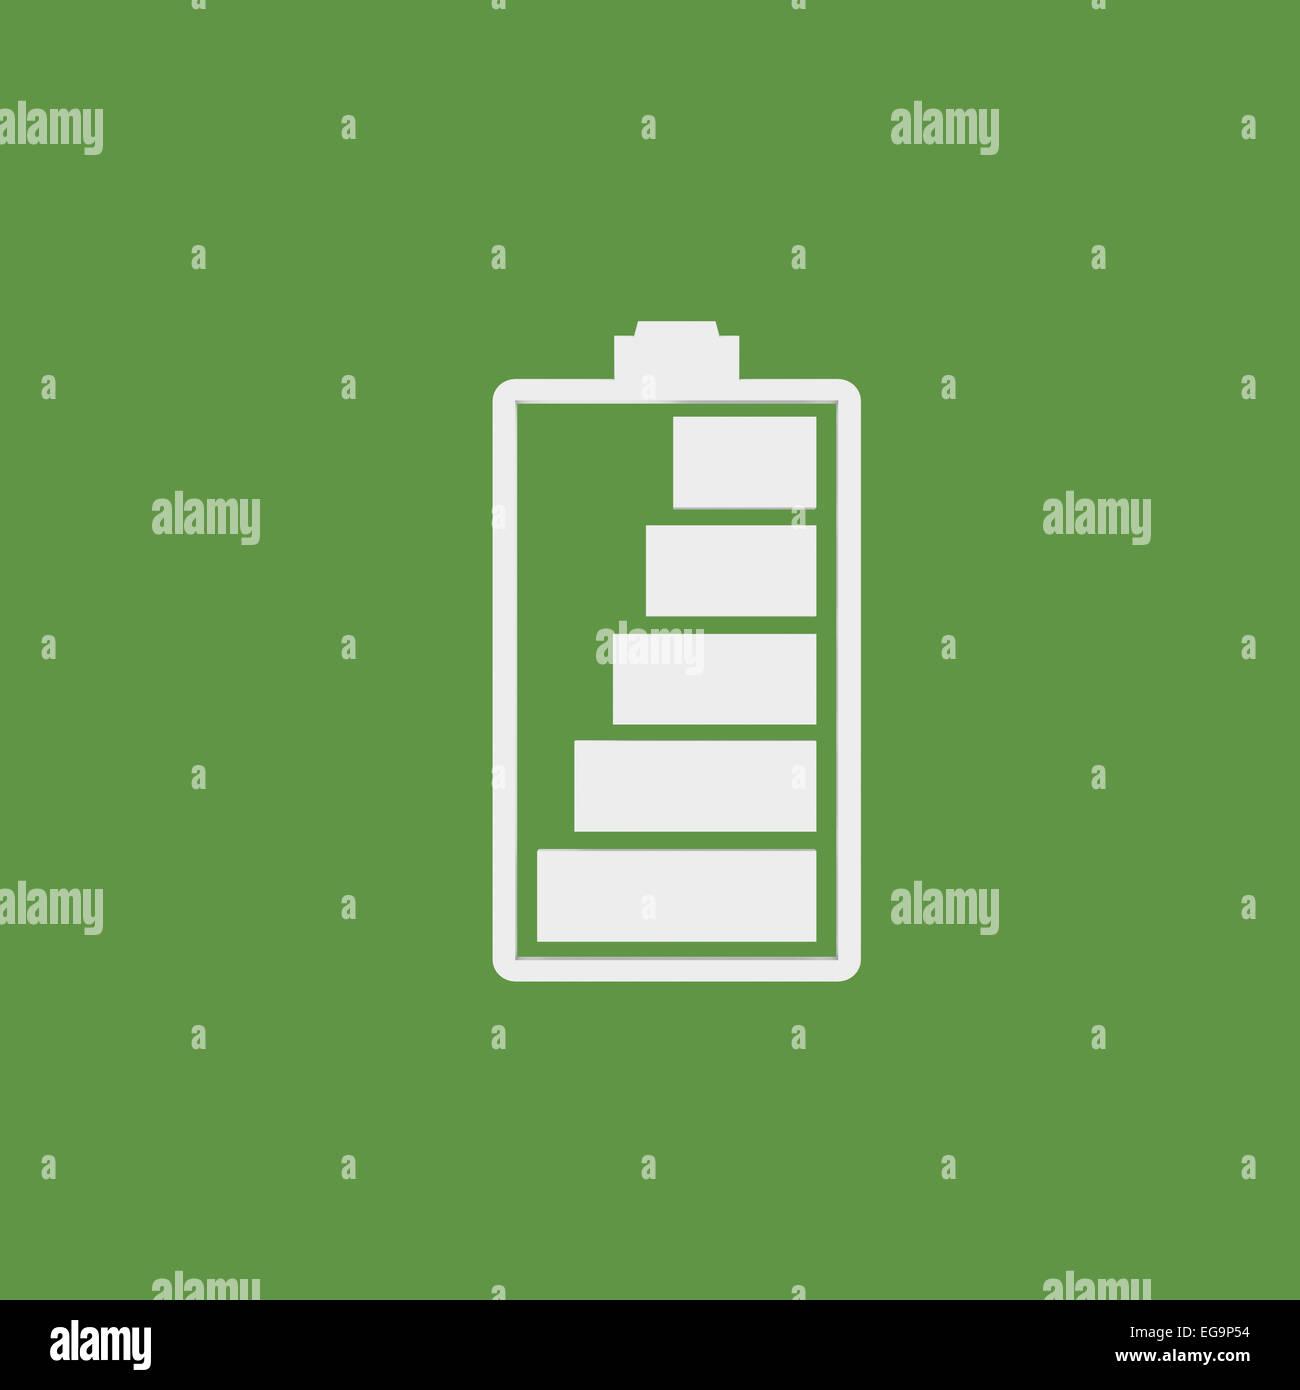 Battery Icon Stockfotos & Battery Icon Bilder - Alamy